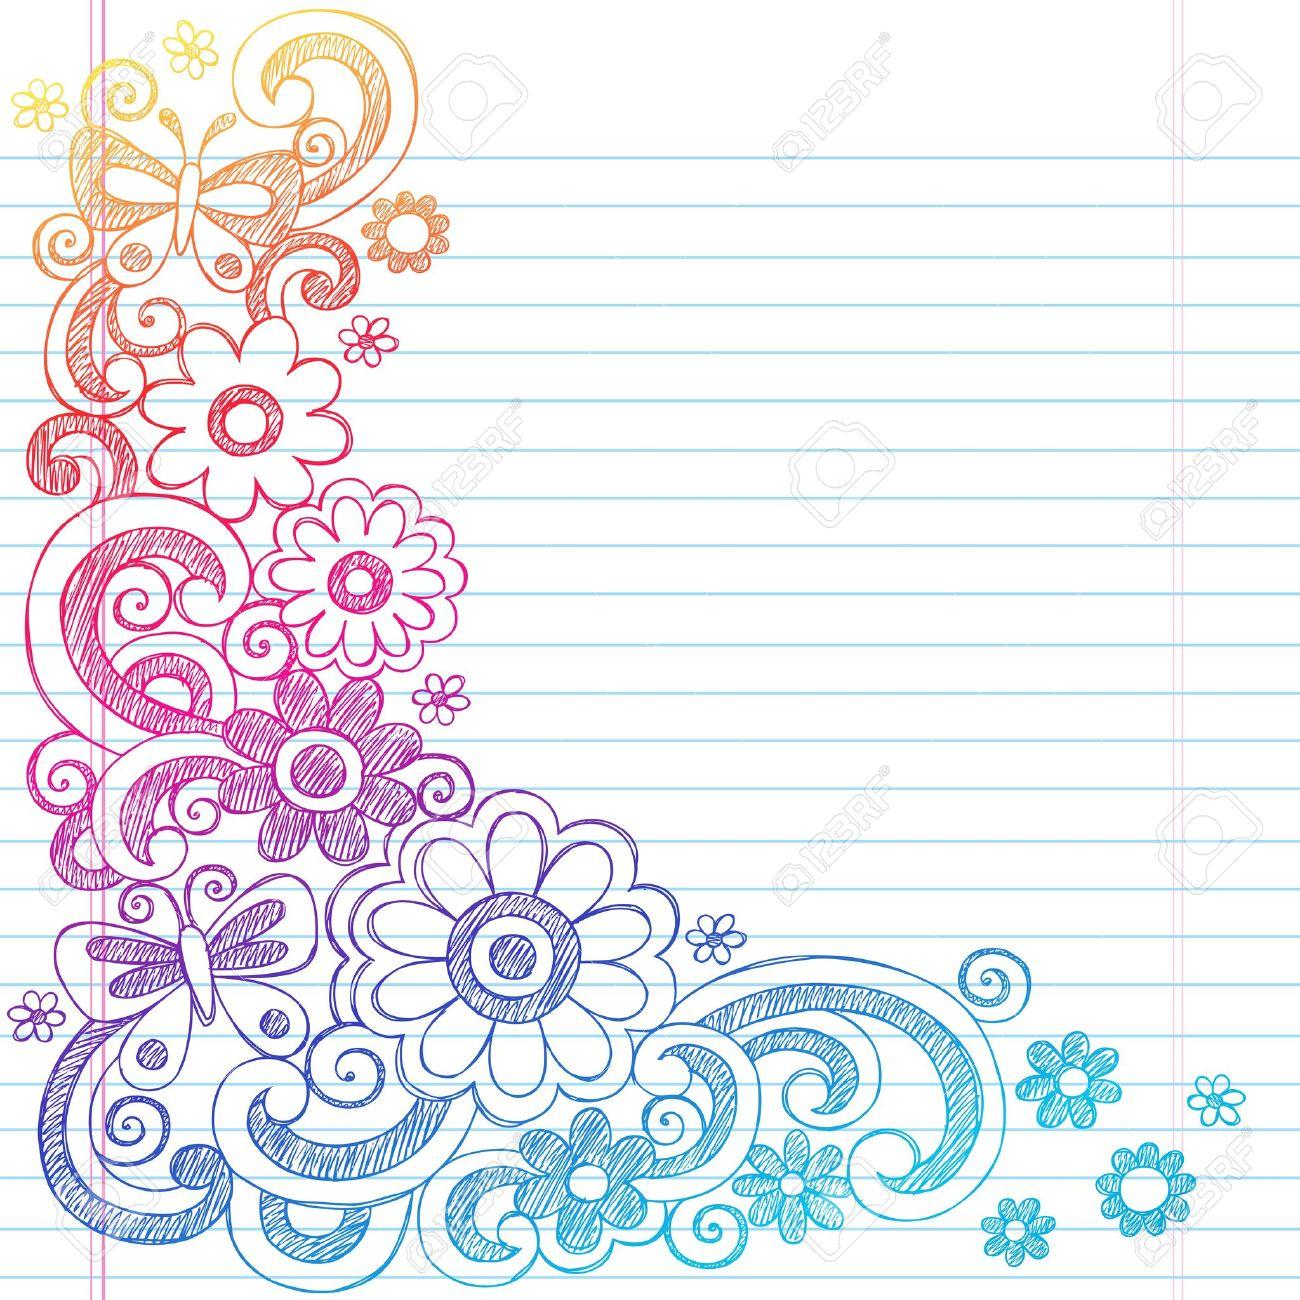 Springtime Flower Power and Butterflies Back to School Sketchy Notebook Doodles-  Illustration Design on Lined Sketchbook Paper Background Stock Vector - 18705022